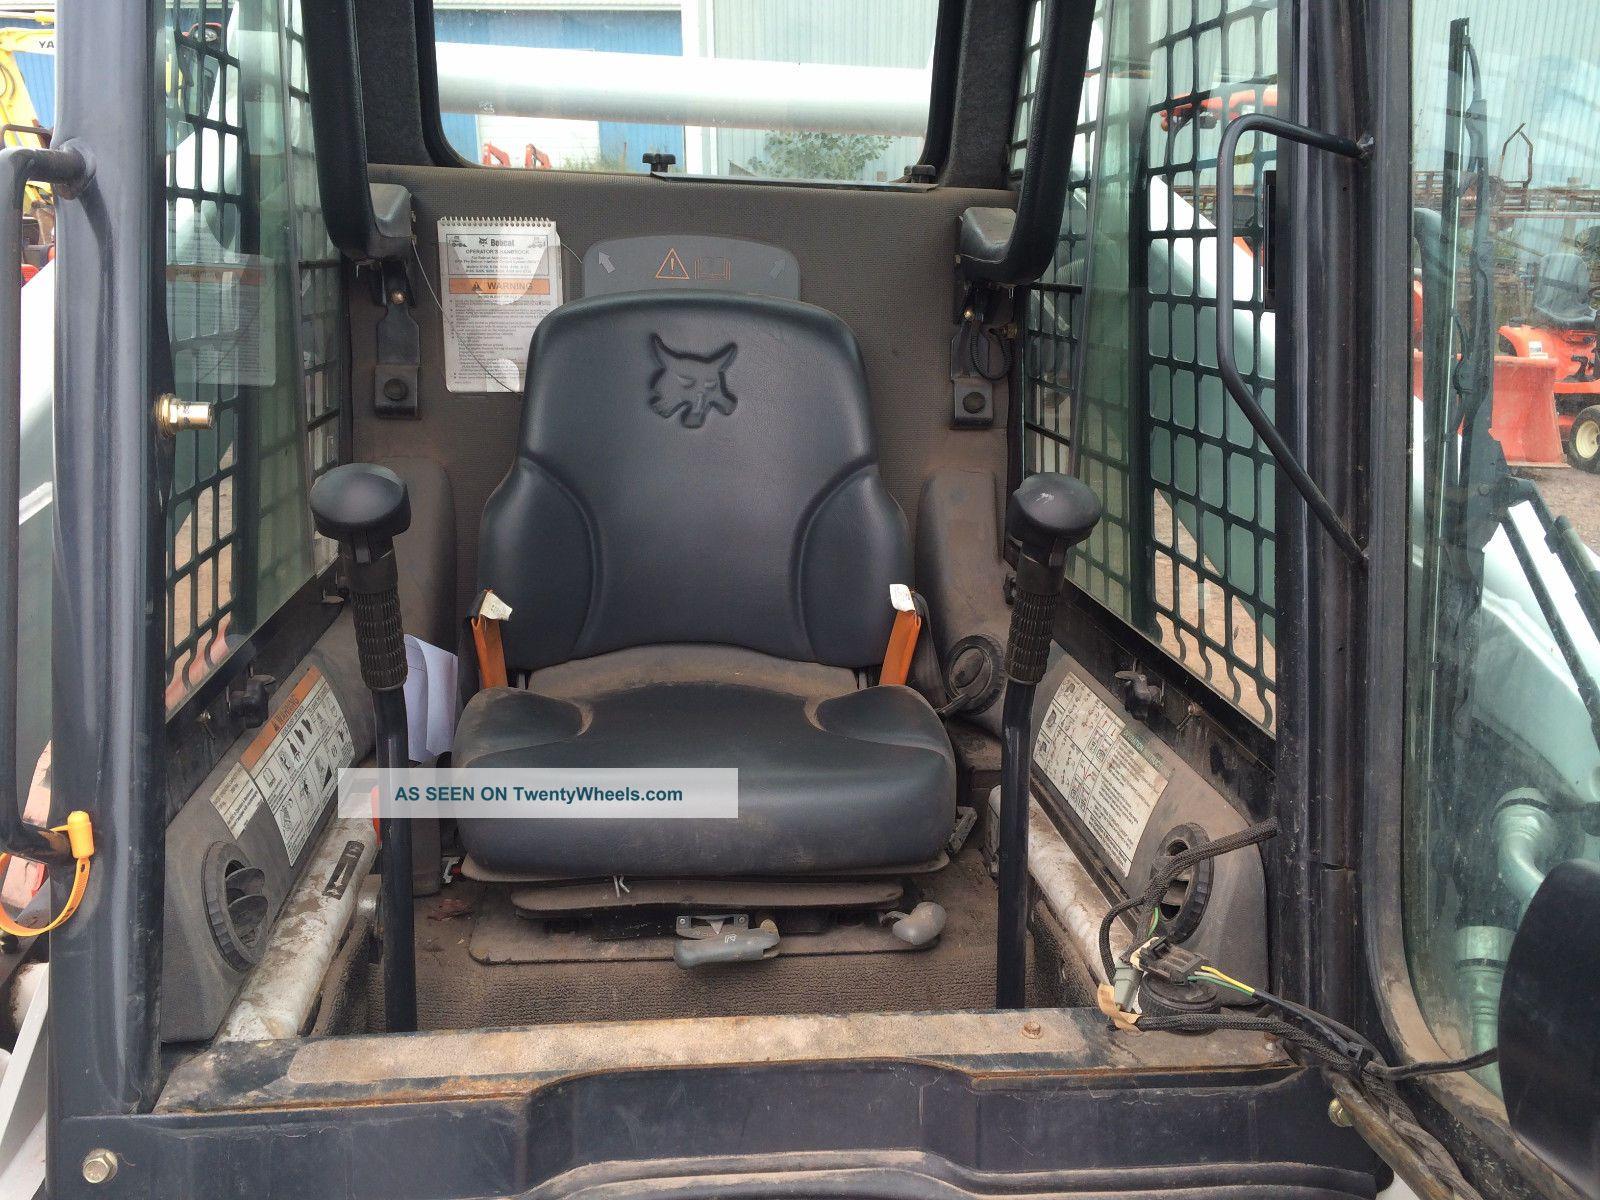 2010 Bobcat S250 Skid Steer Loader Cab Heat Air Pre Emmision